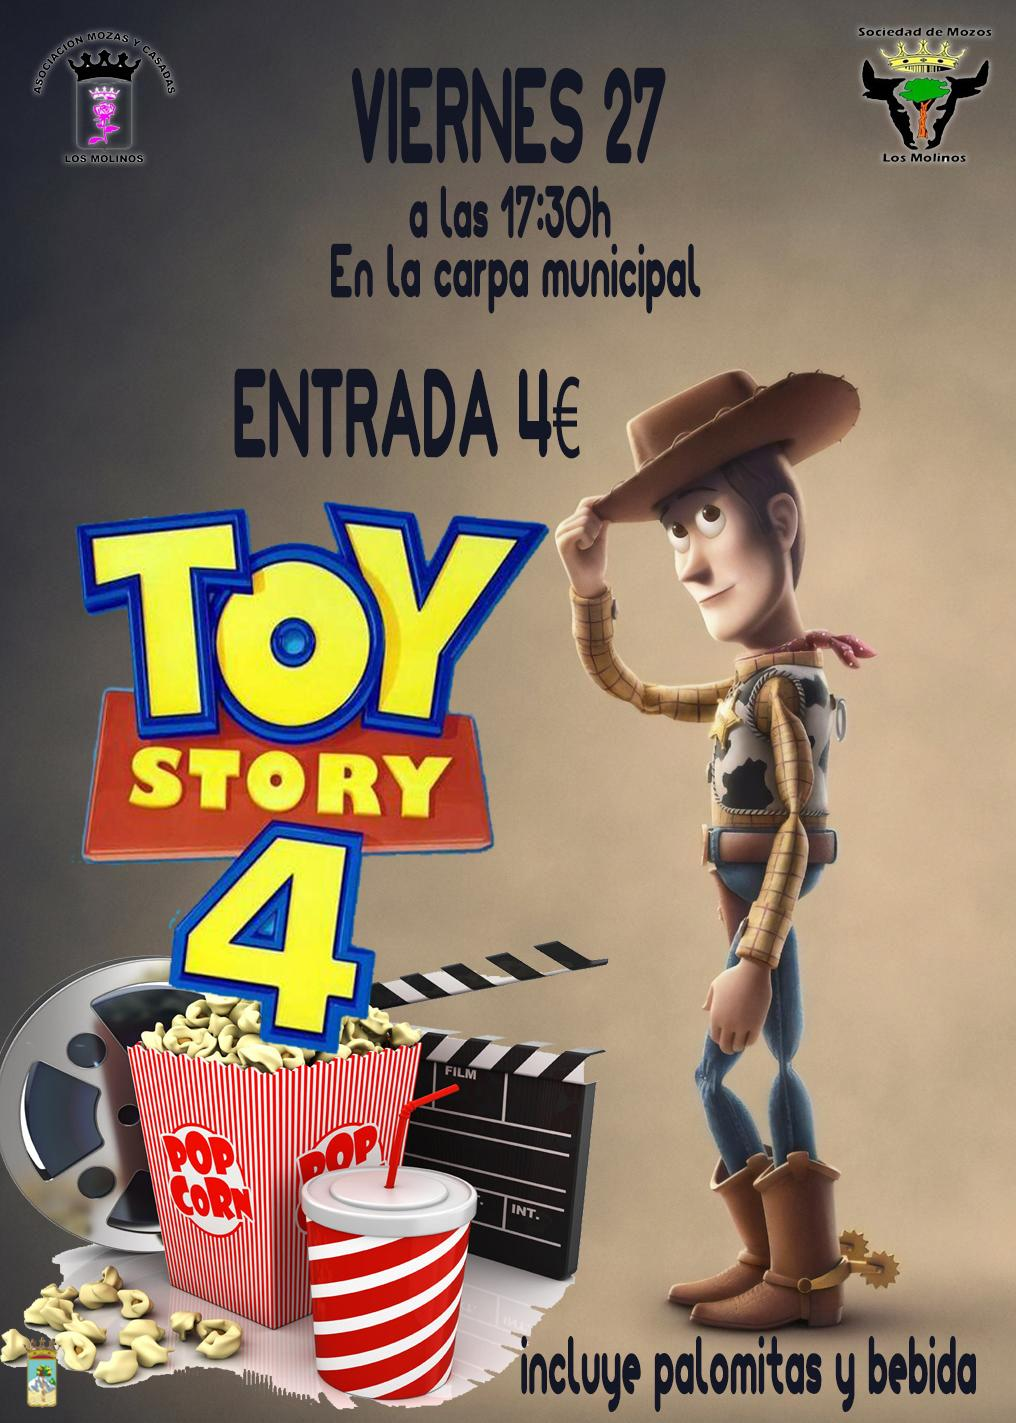 "TARDE DE CINE:  ""TOY STORY 4"" @ Antiguo colegio (Carpa Municipal)"